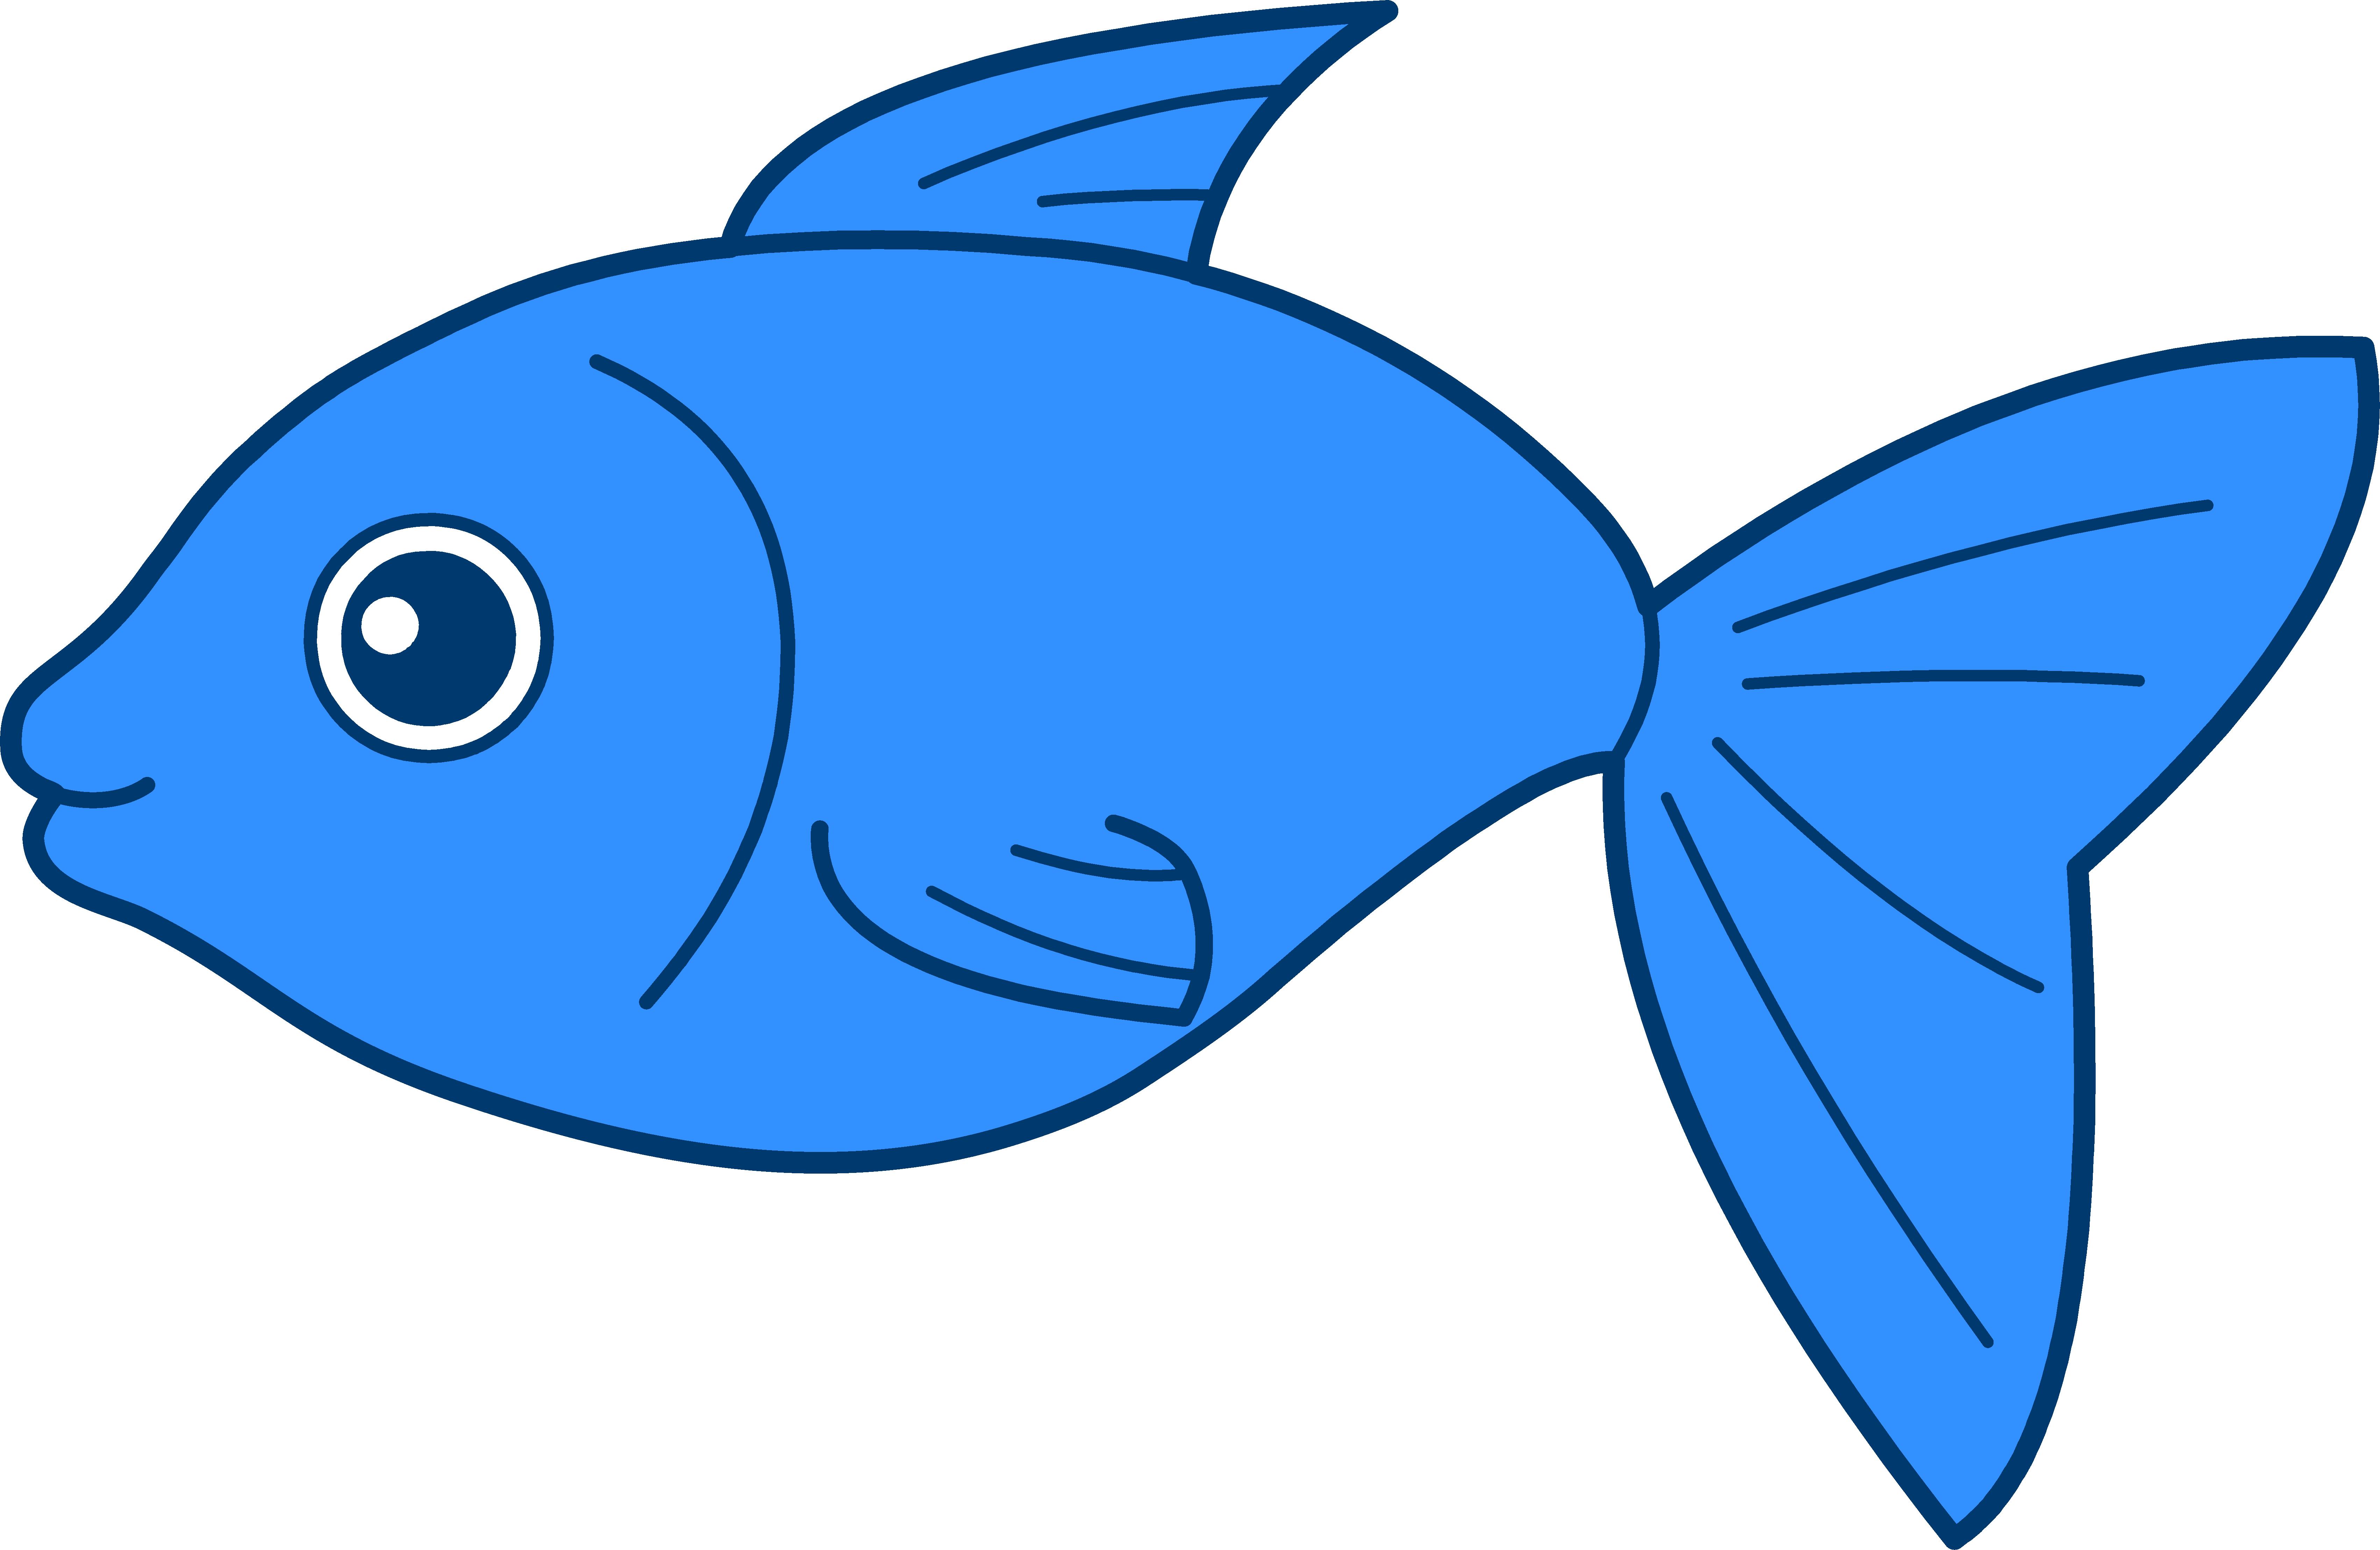 Blue Fish Clip Art | Clipart library - F-Blue Fish Clip Art | Clipart library - Free Clipart Images-1